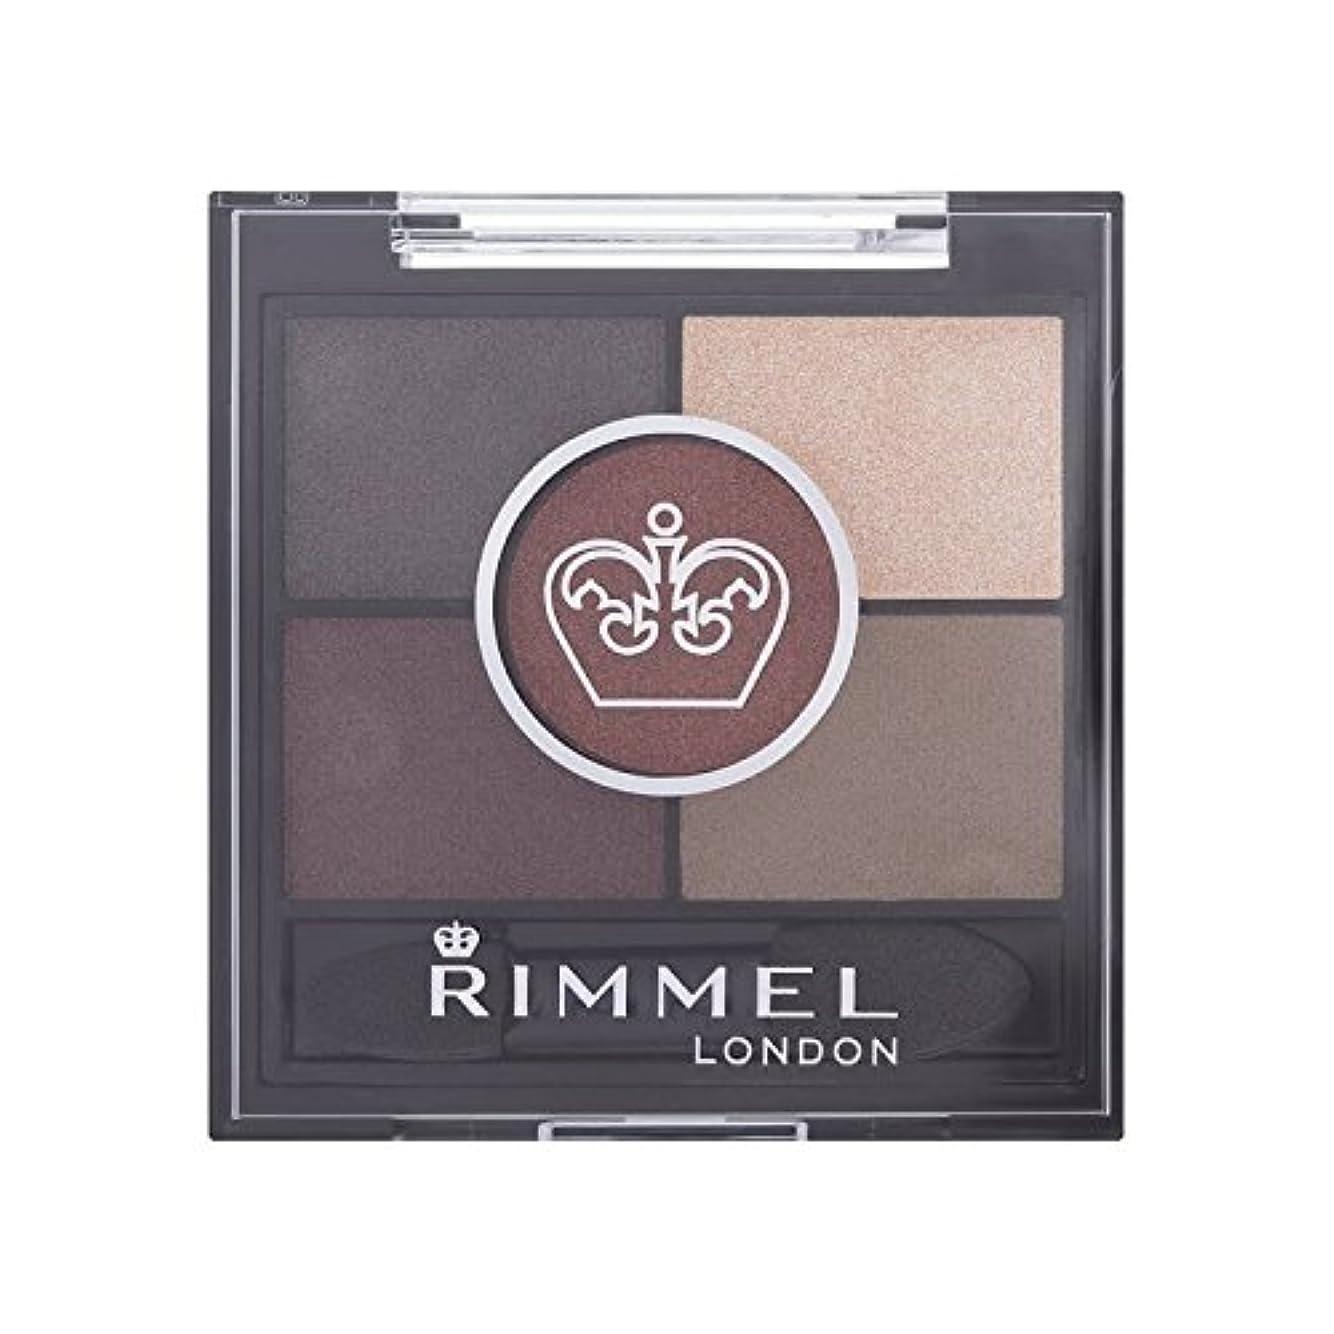 Rimmel 5 Pan Eyeshadow Brixton Brown - 茶色のブリクストンリンメル5パンアイシャドウ [並行輸入品]